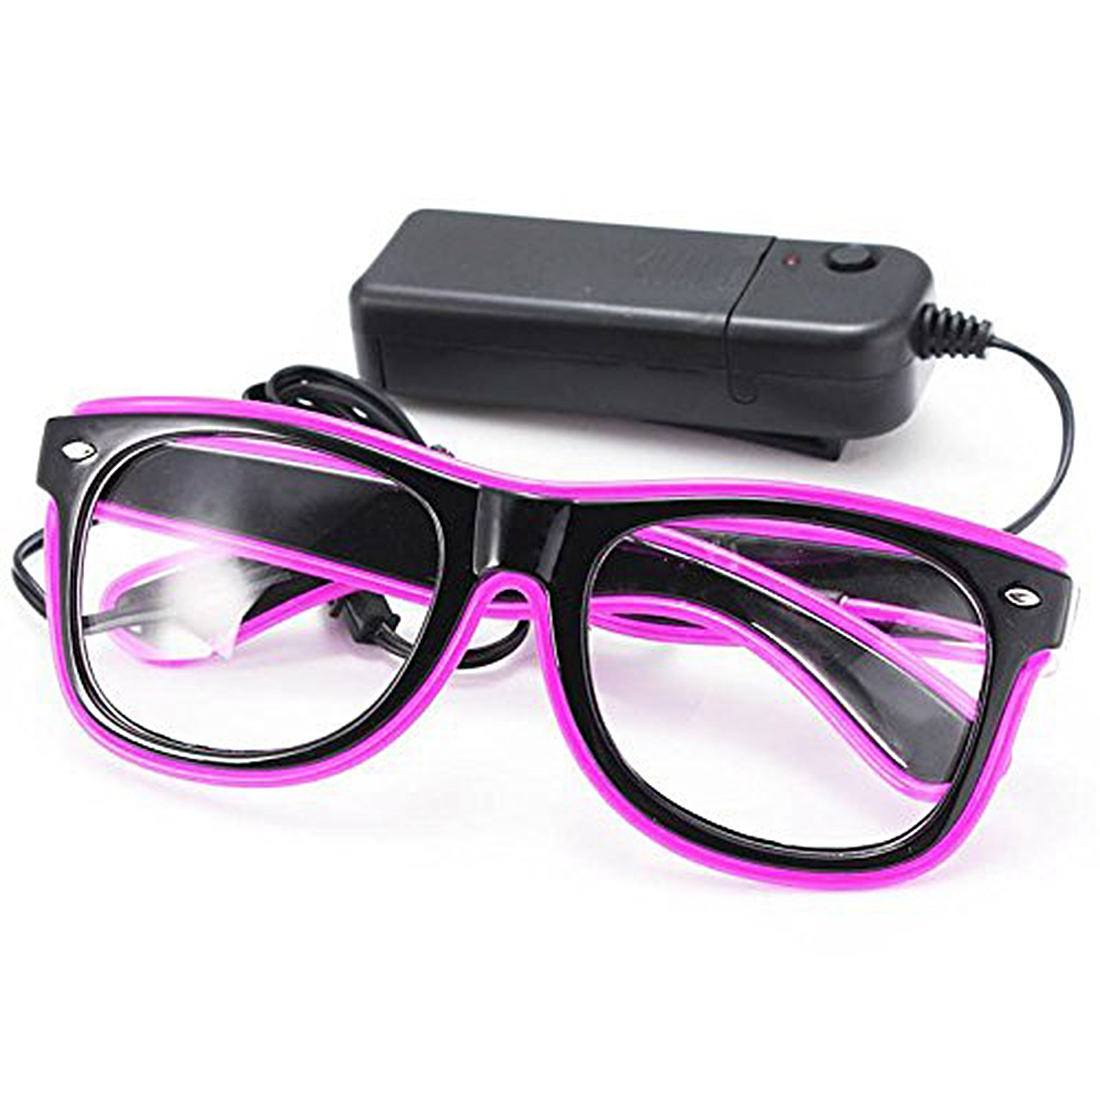 LED Light Glasses Party Toy Glasses Purple